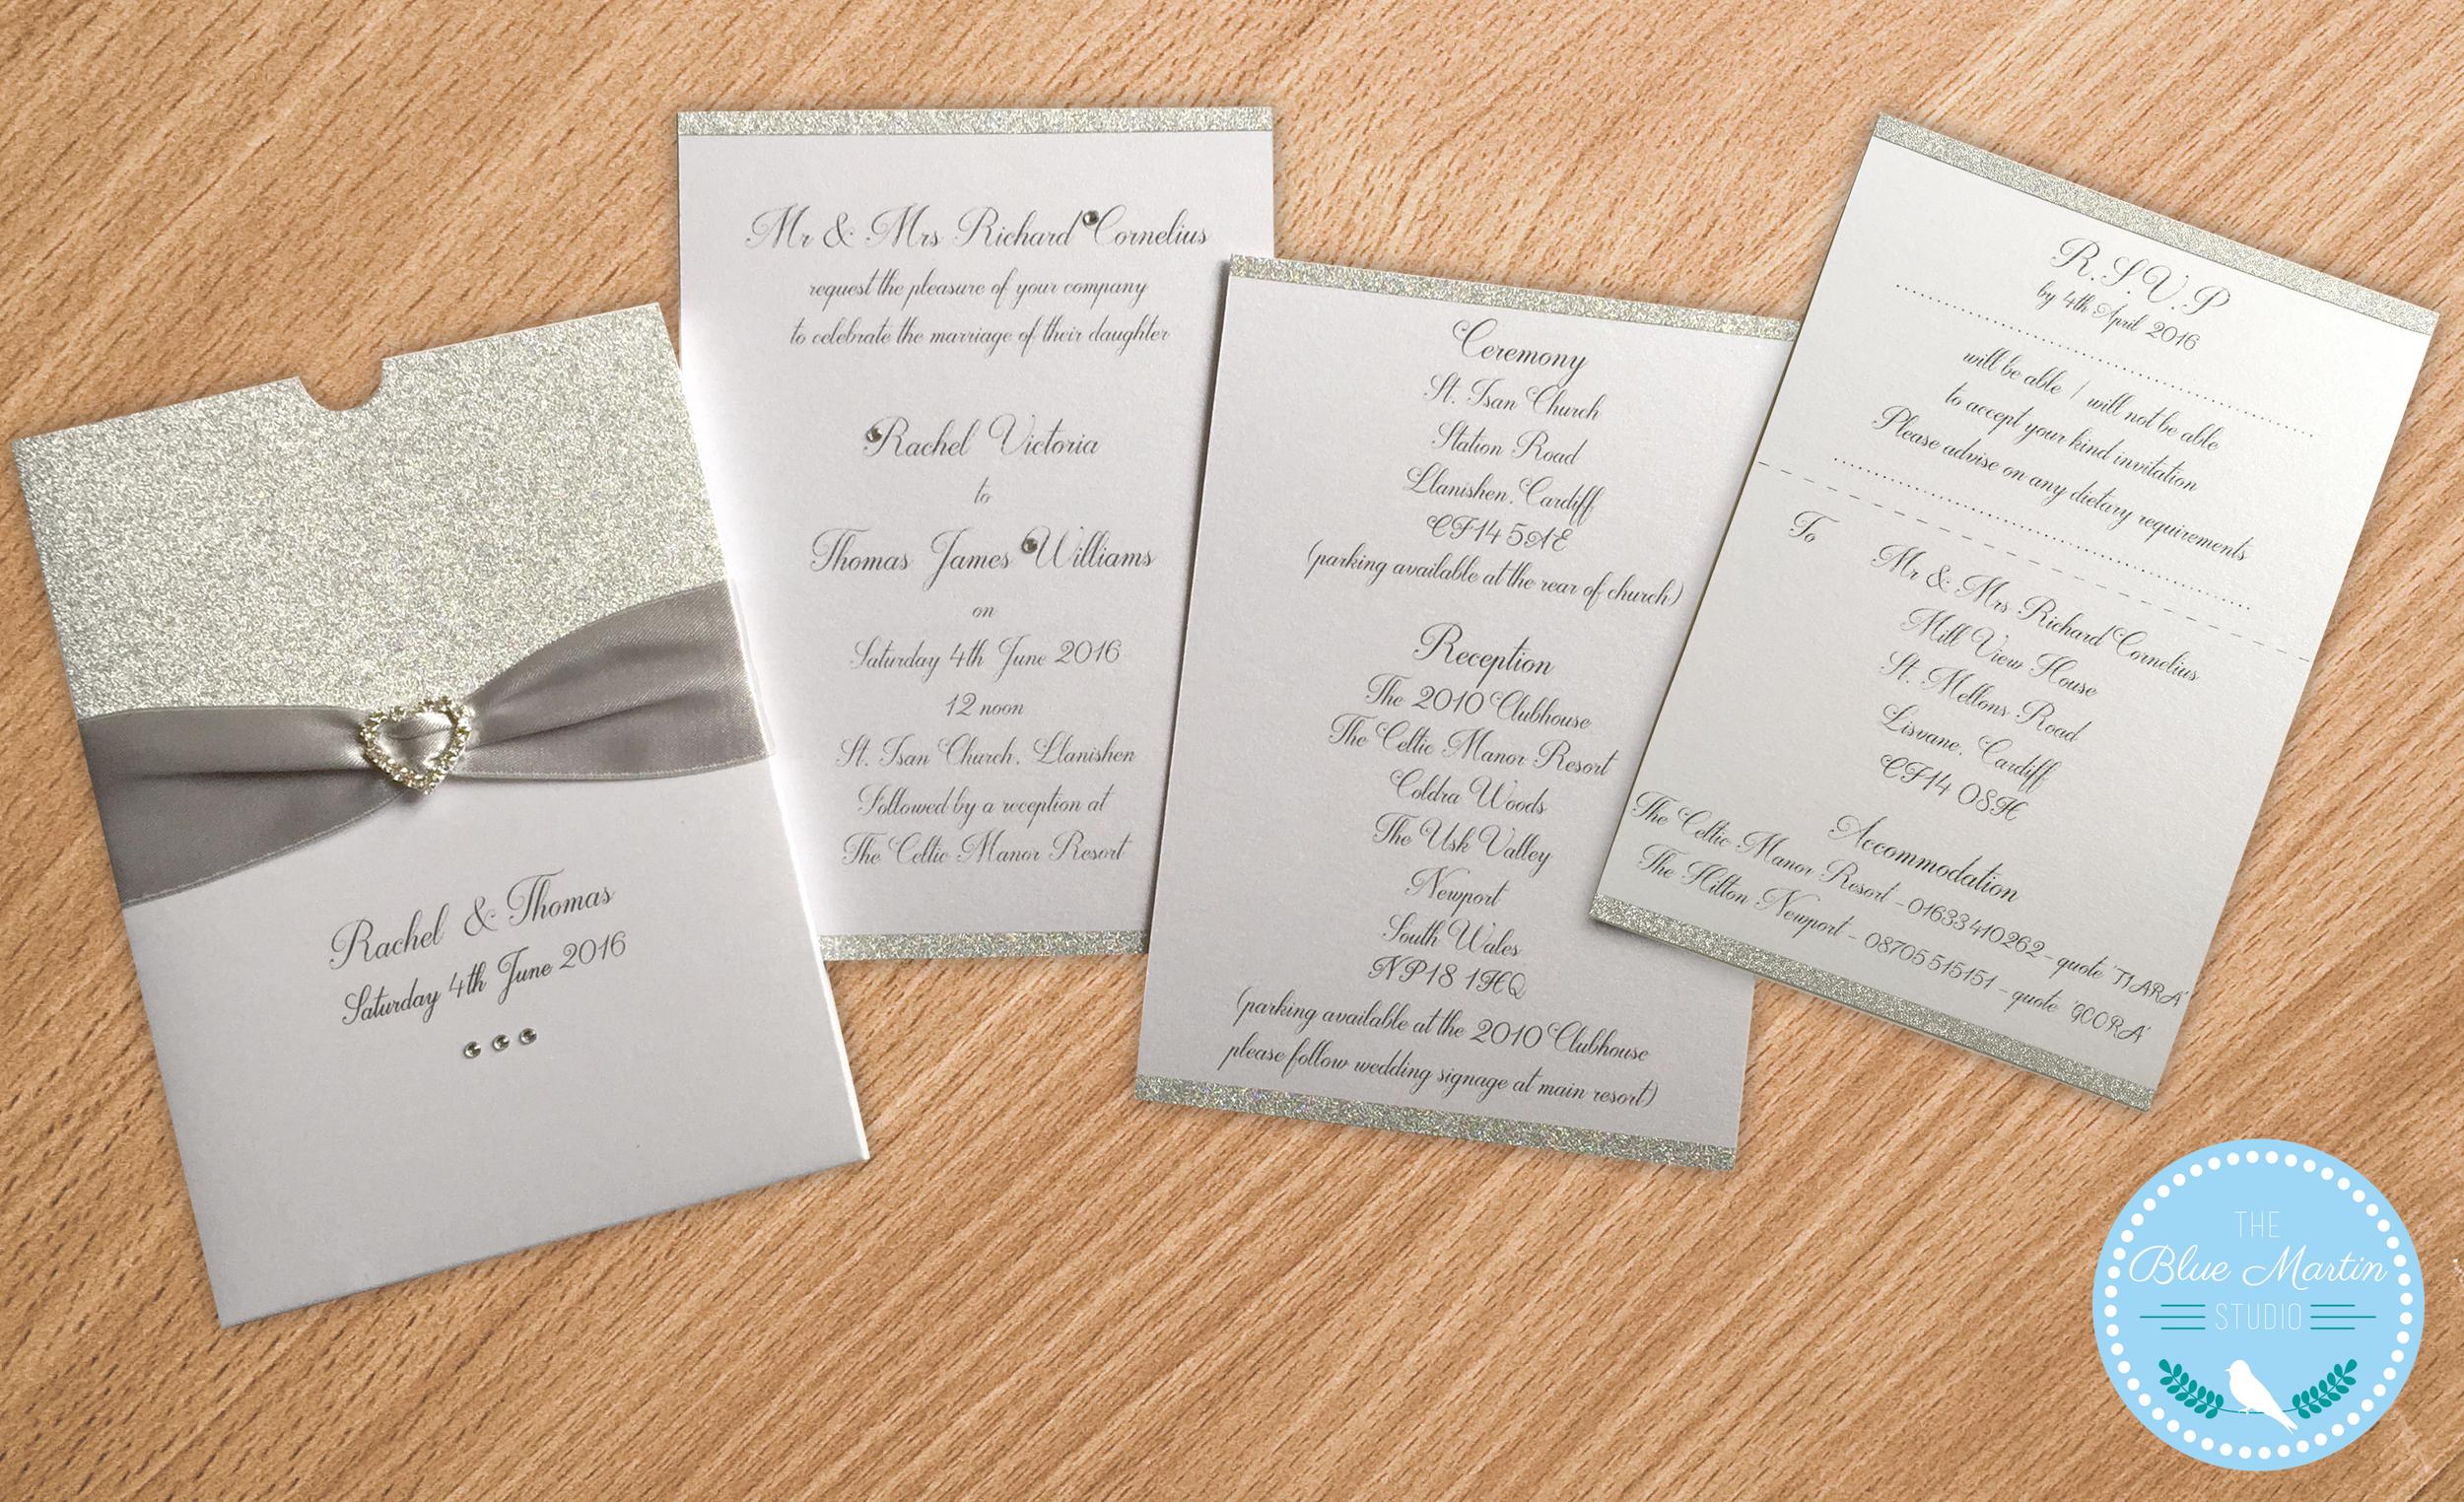 Wedding-InvitationFull-Blog-Image.png